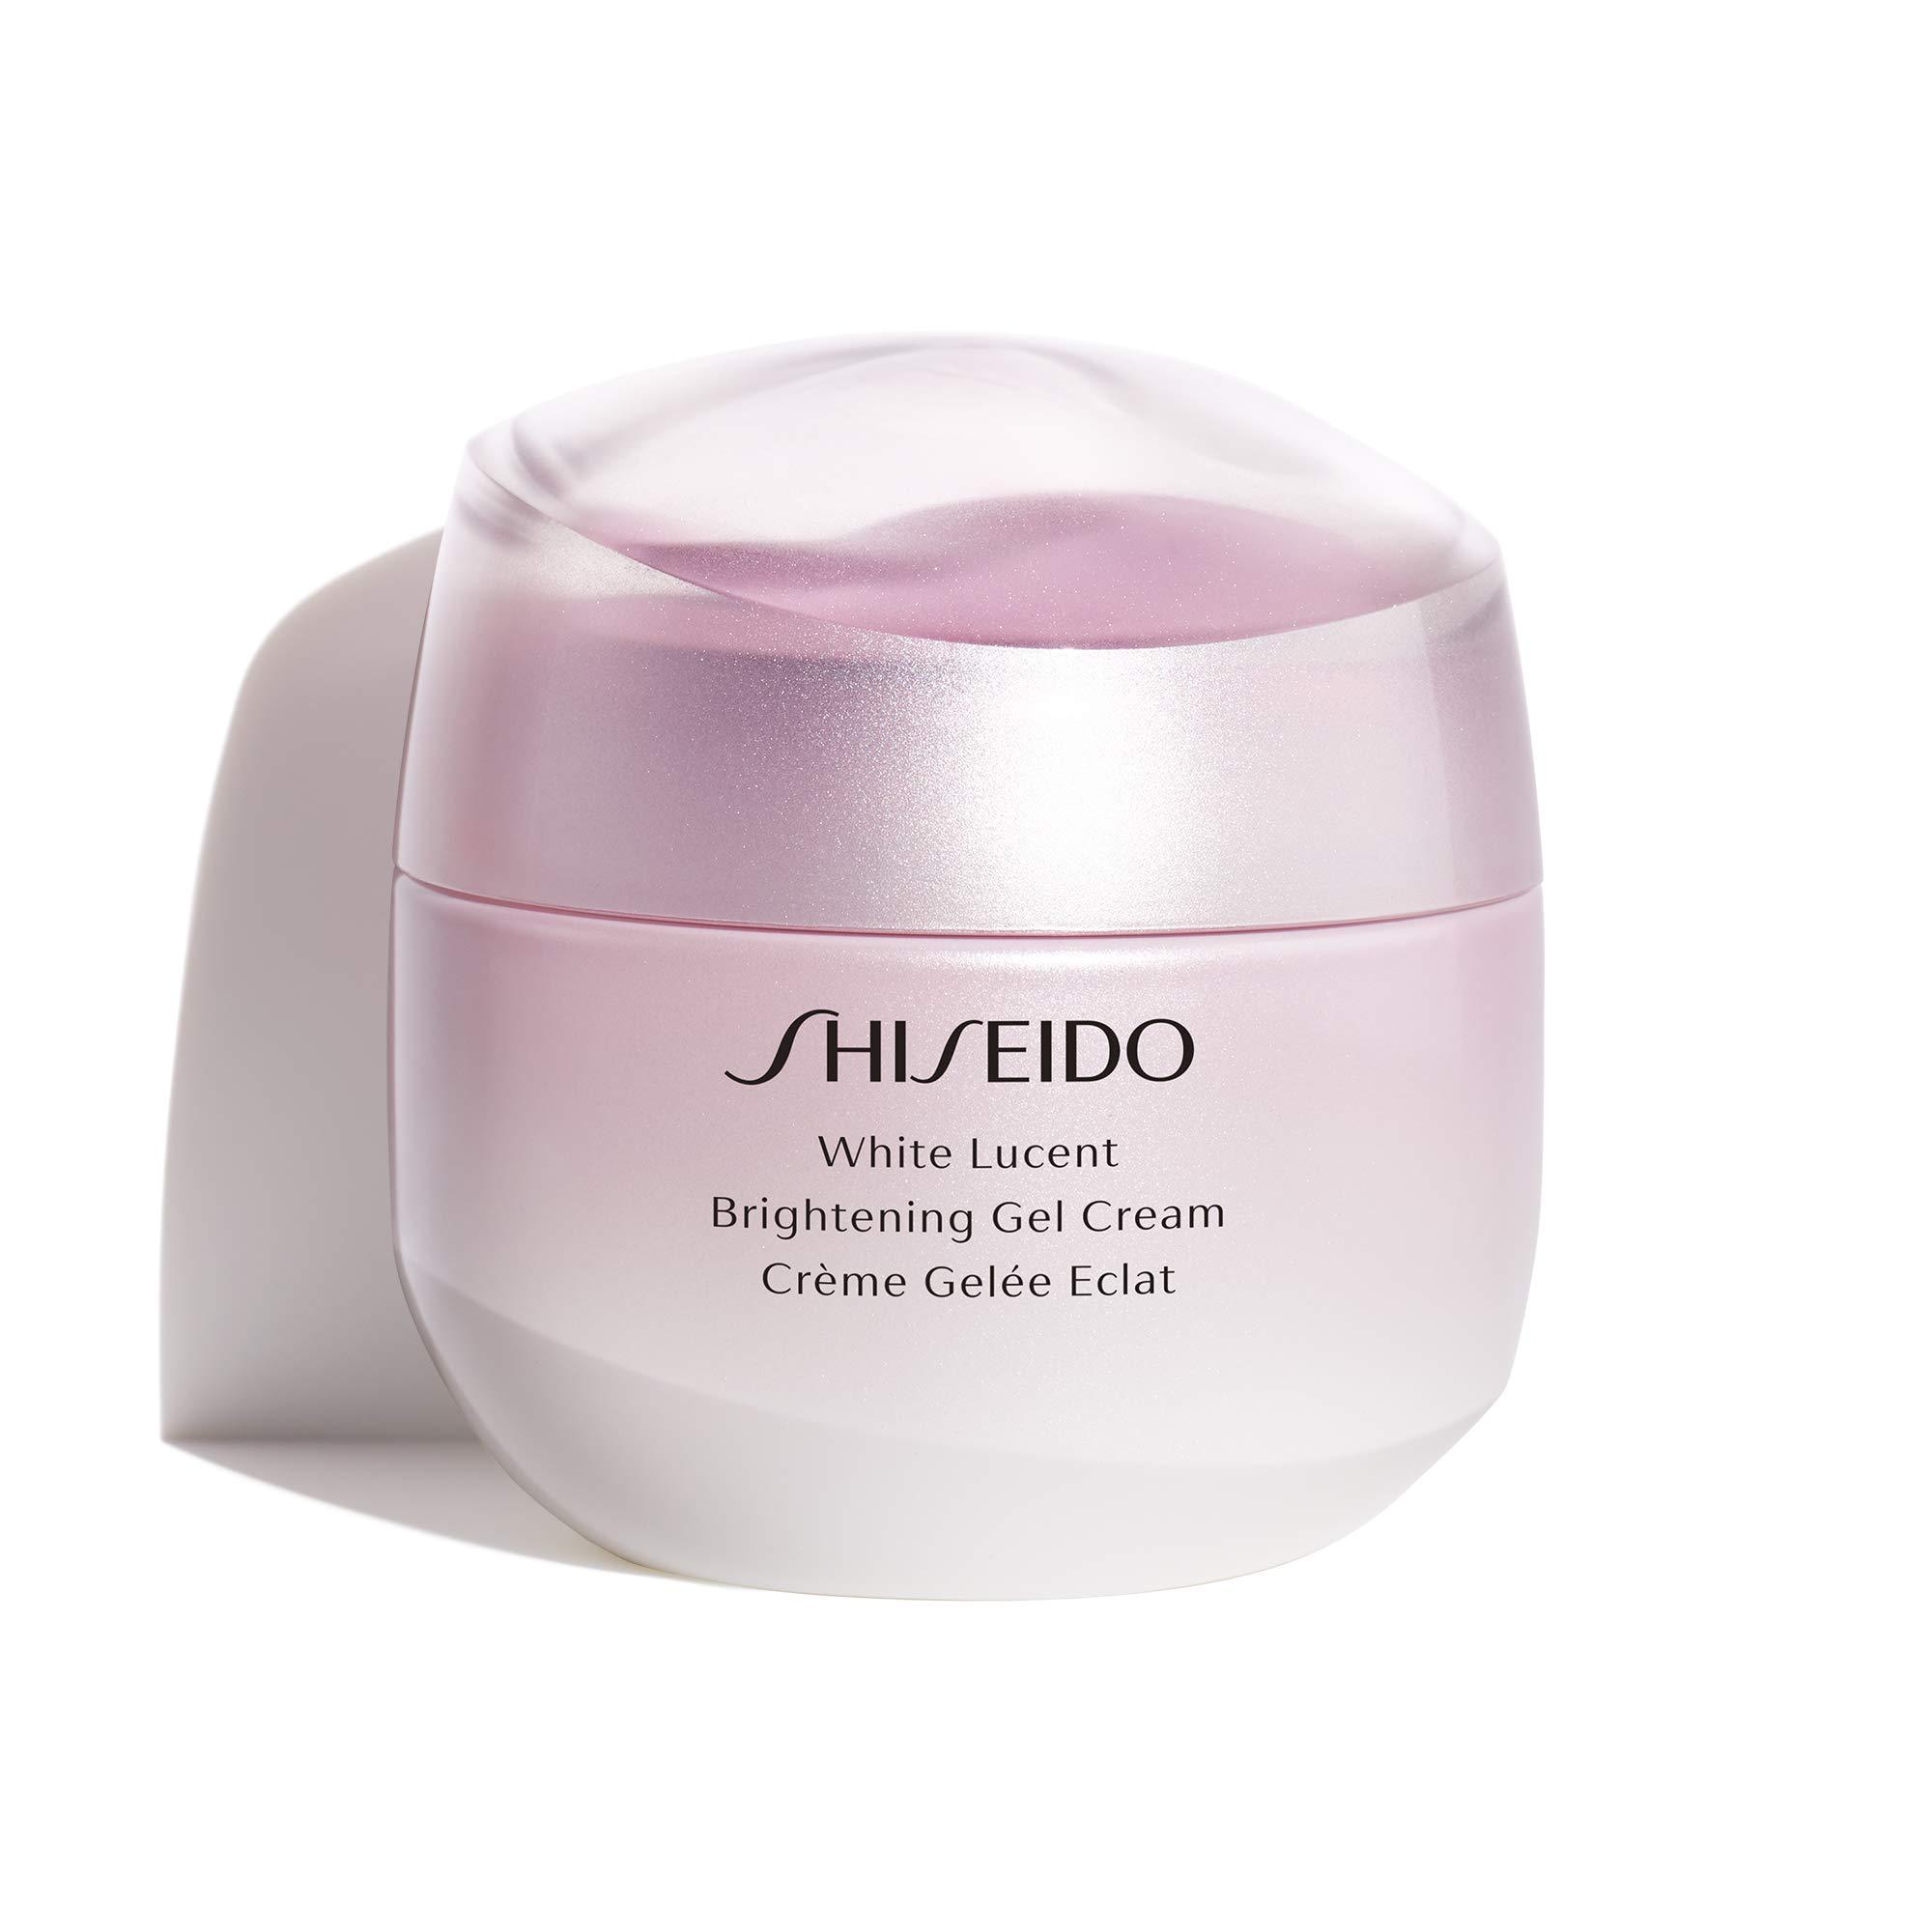 White Lucent by Shiseido Brightening Gel Cream 50ml